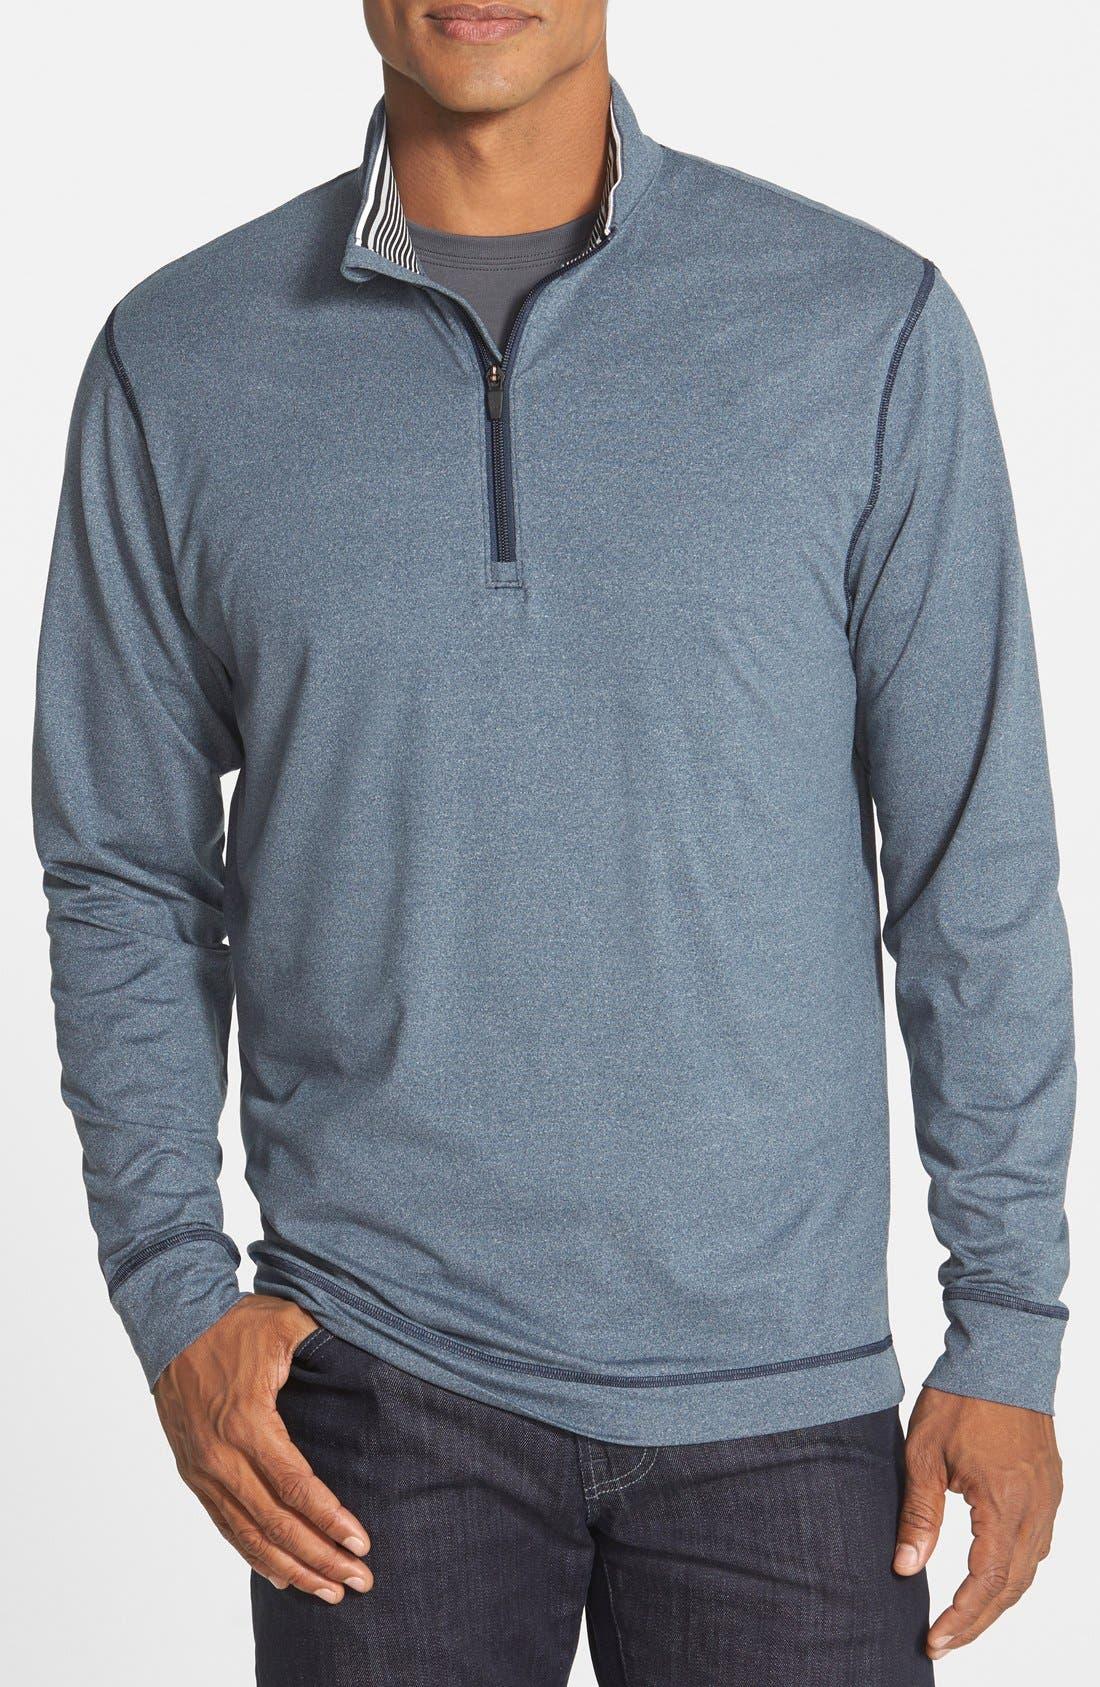 CUTTER & BUCK 'Topspin' DryTec Half Zip Pullover, Main, color, NAVY HEATHER